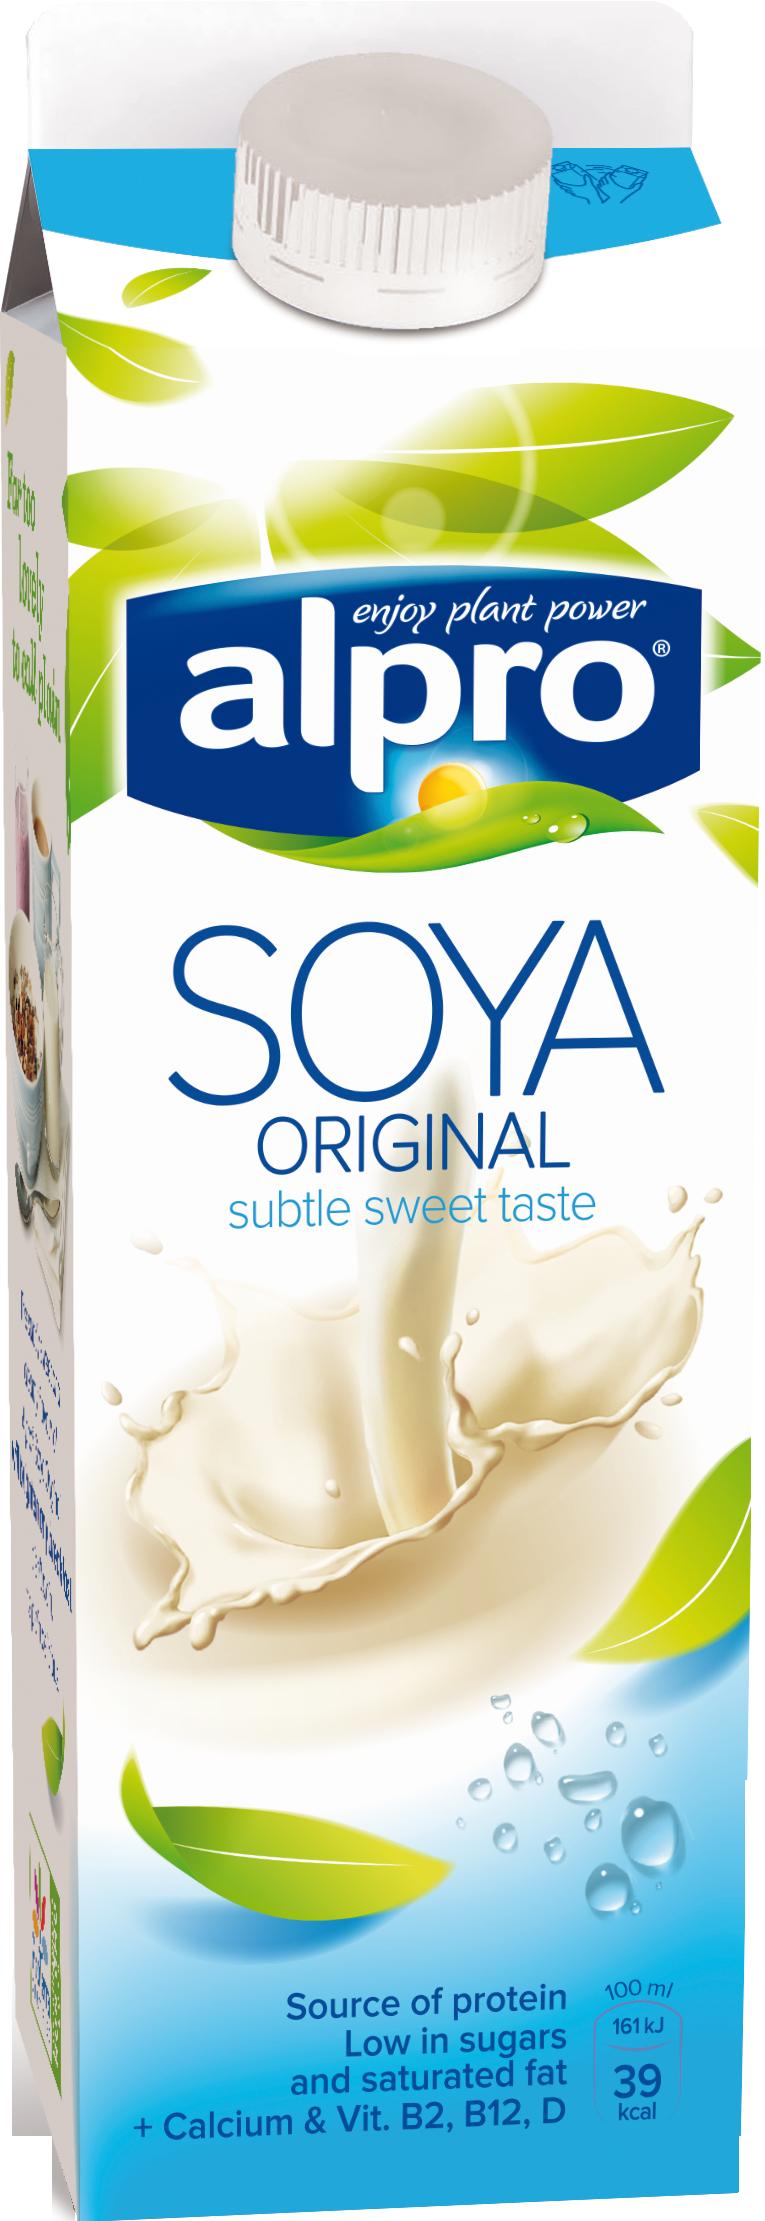 Alpro Soya Original Chilled